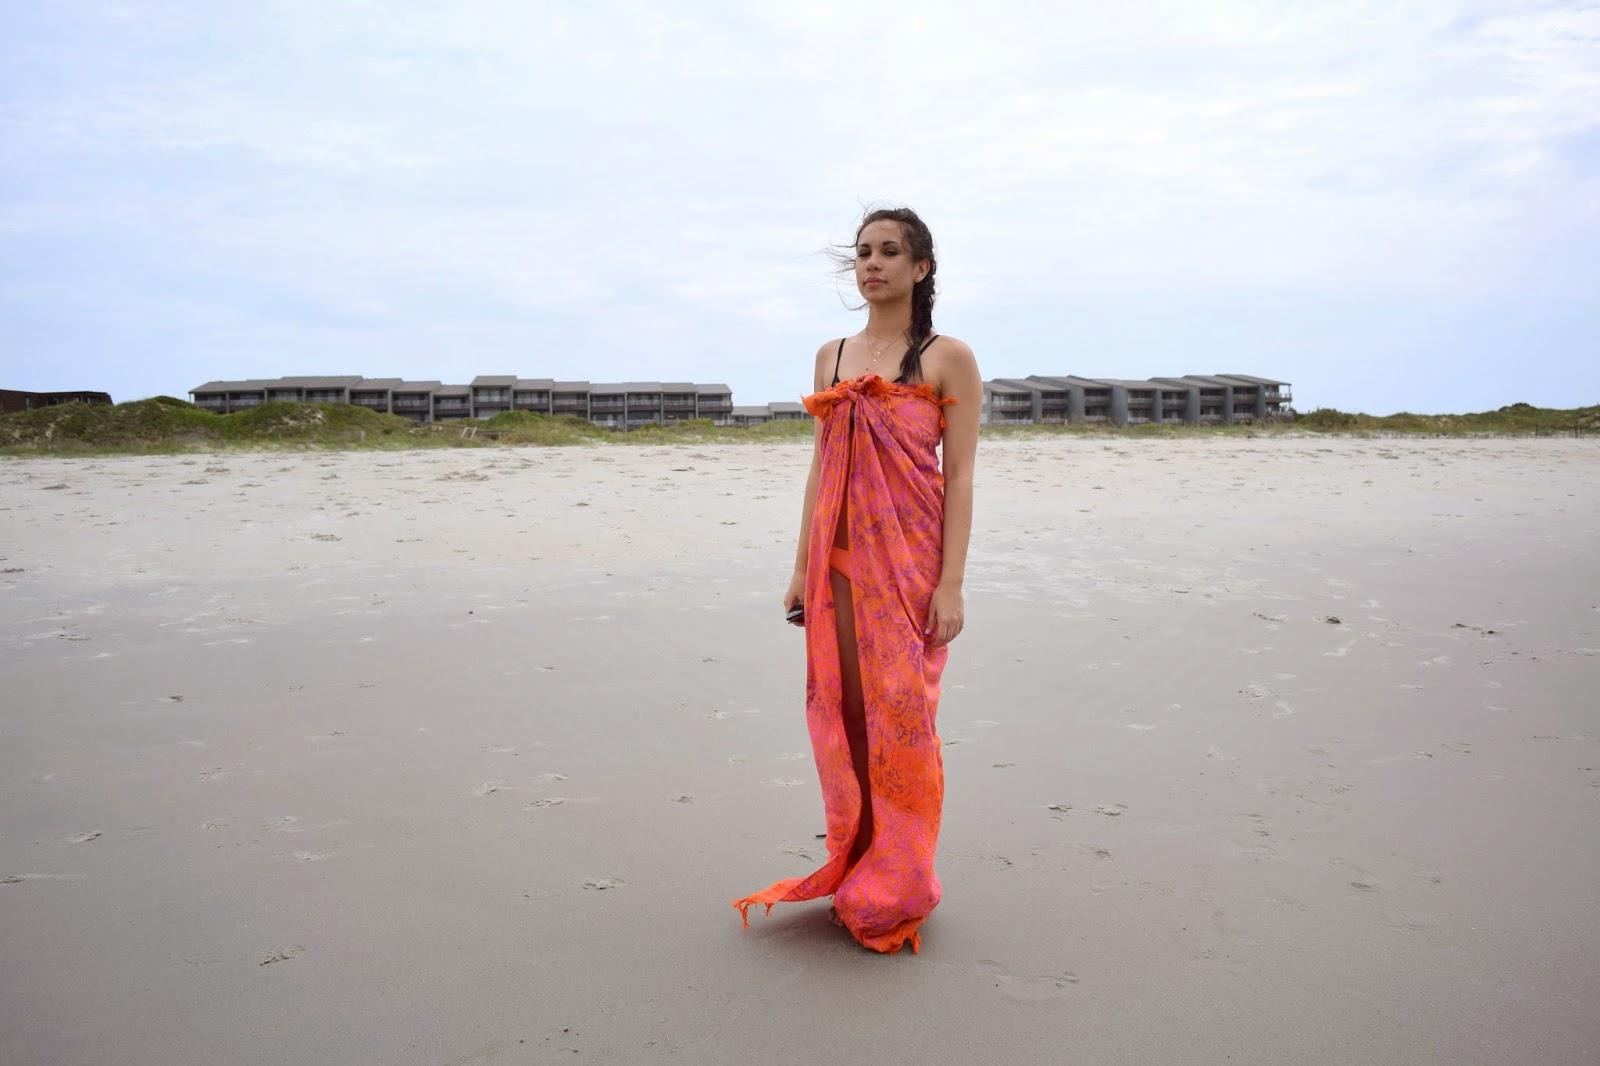 Triangl, beachwear, beach, Mel, Chanel, Westward, Leaning, Gorjana, gold, minimalist, jewelry, sarong, flip-flops, black and white, tan